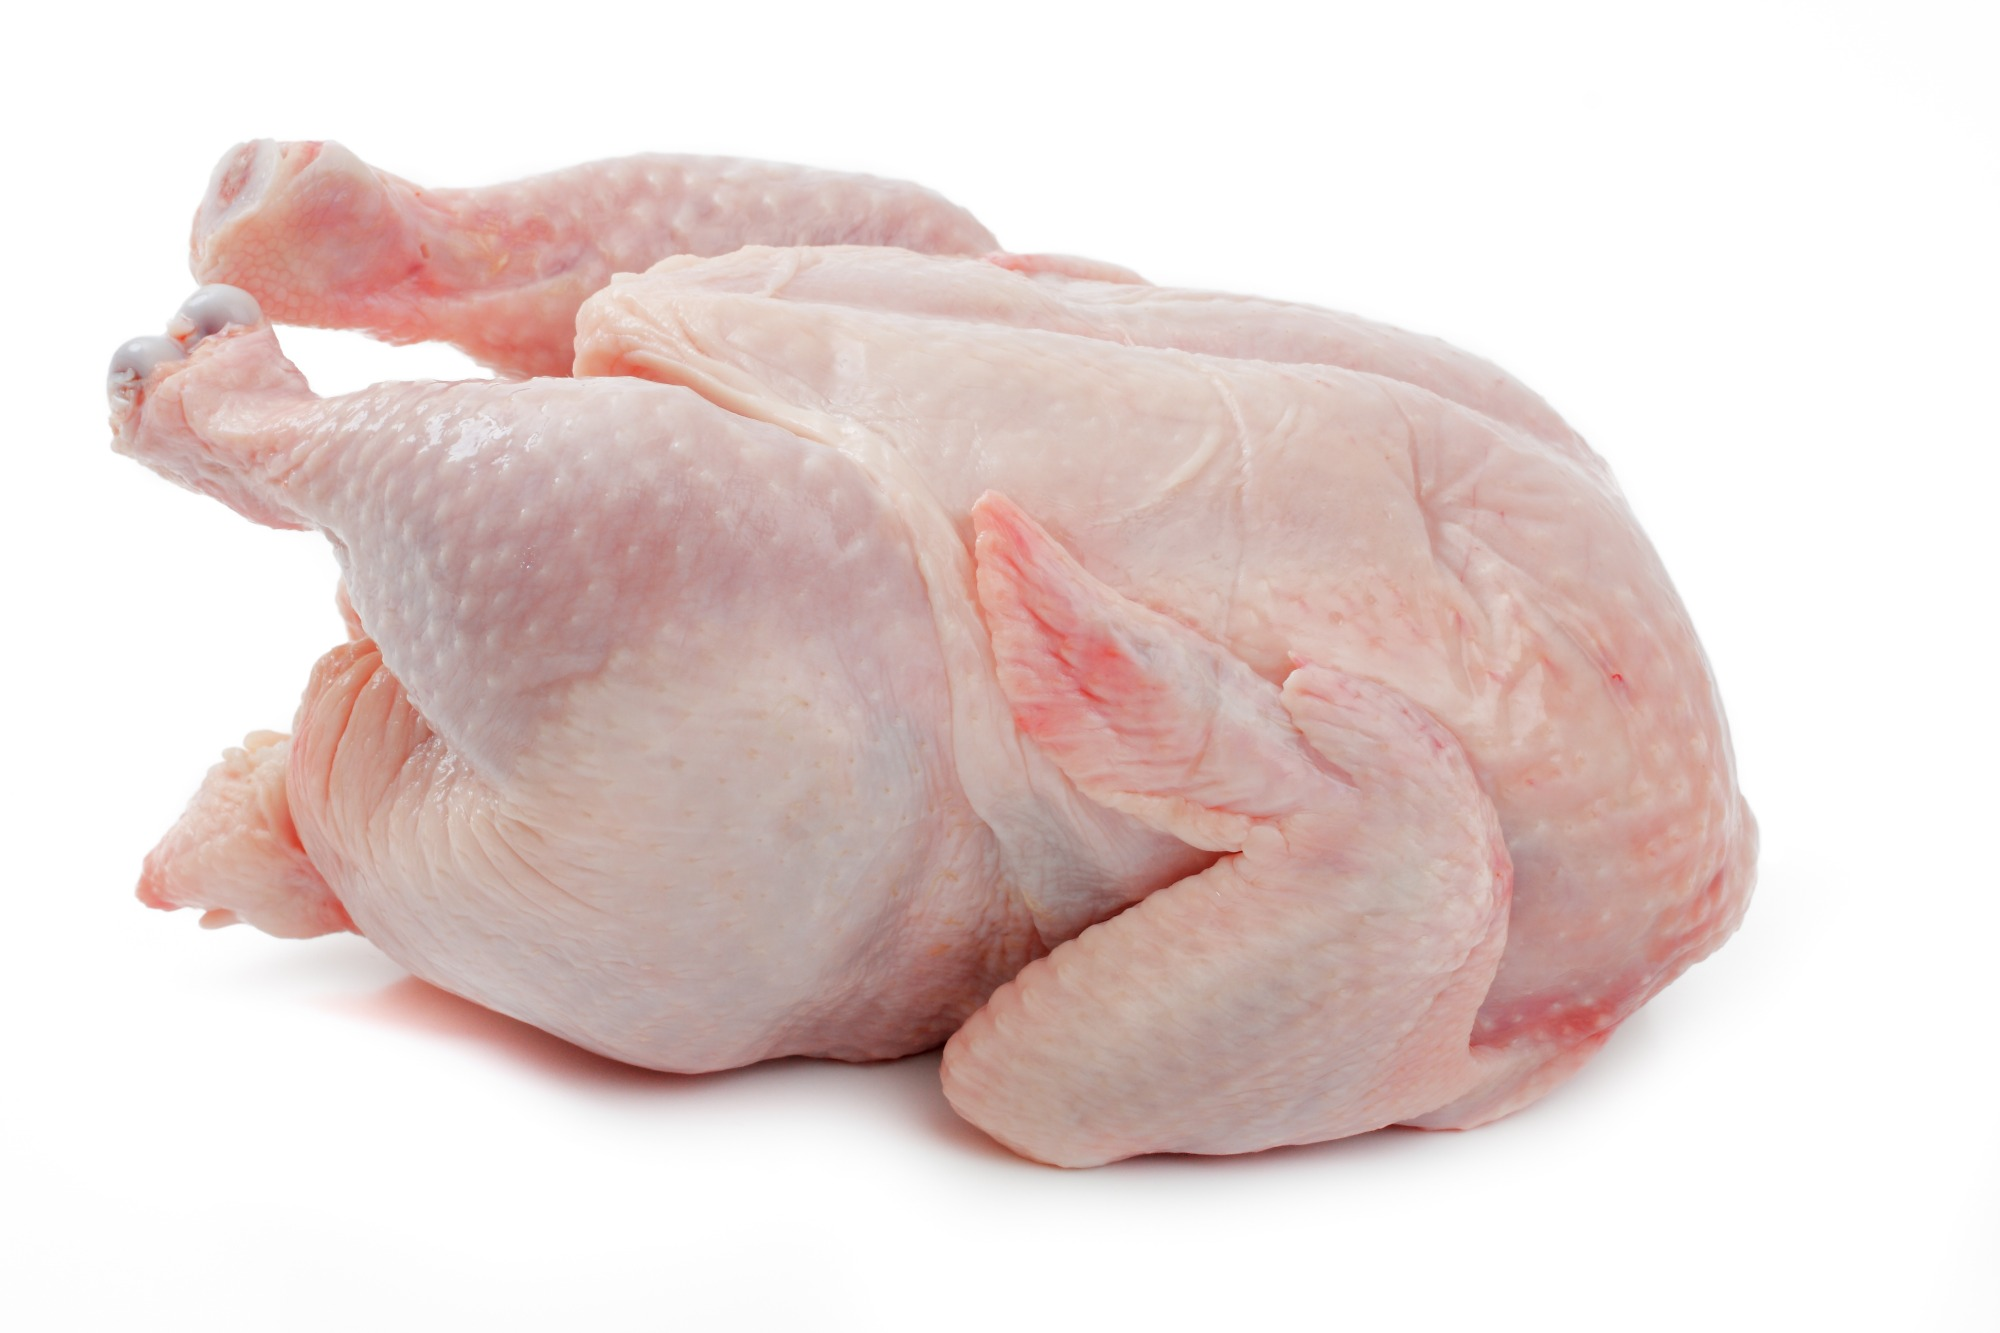 Mercado de frango registra baixo volume de vendas